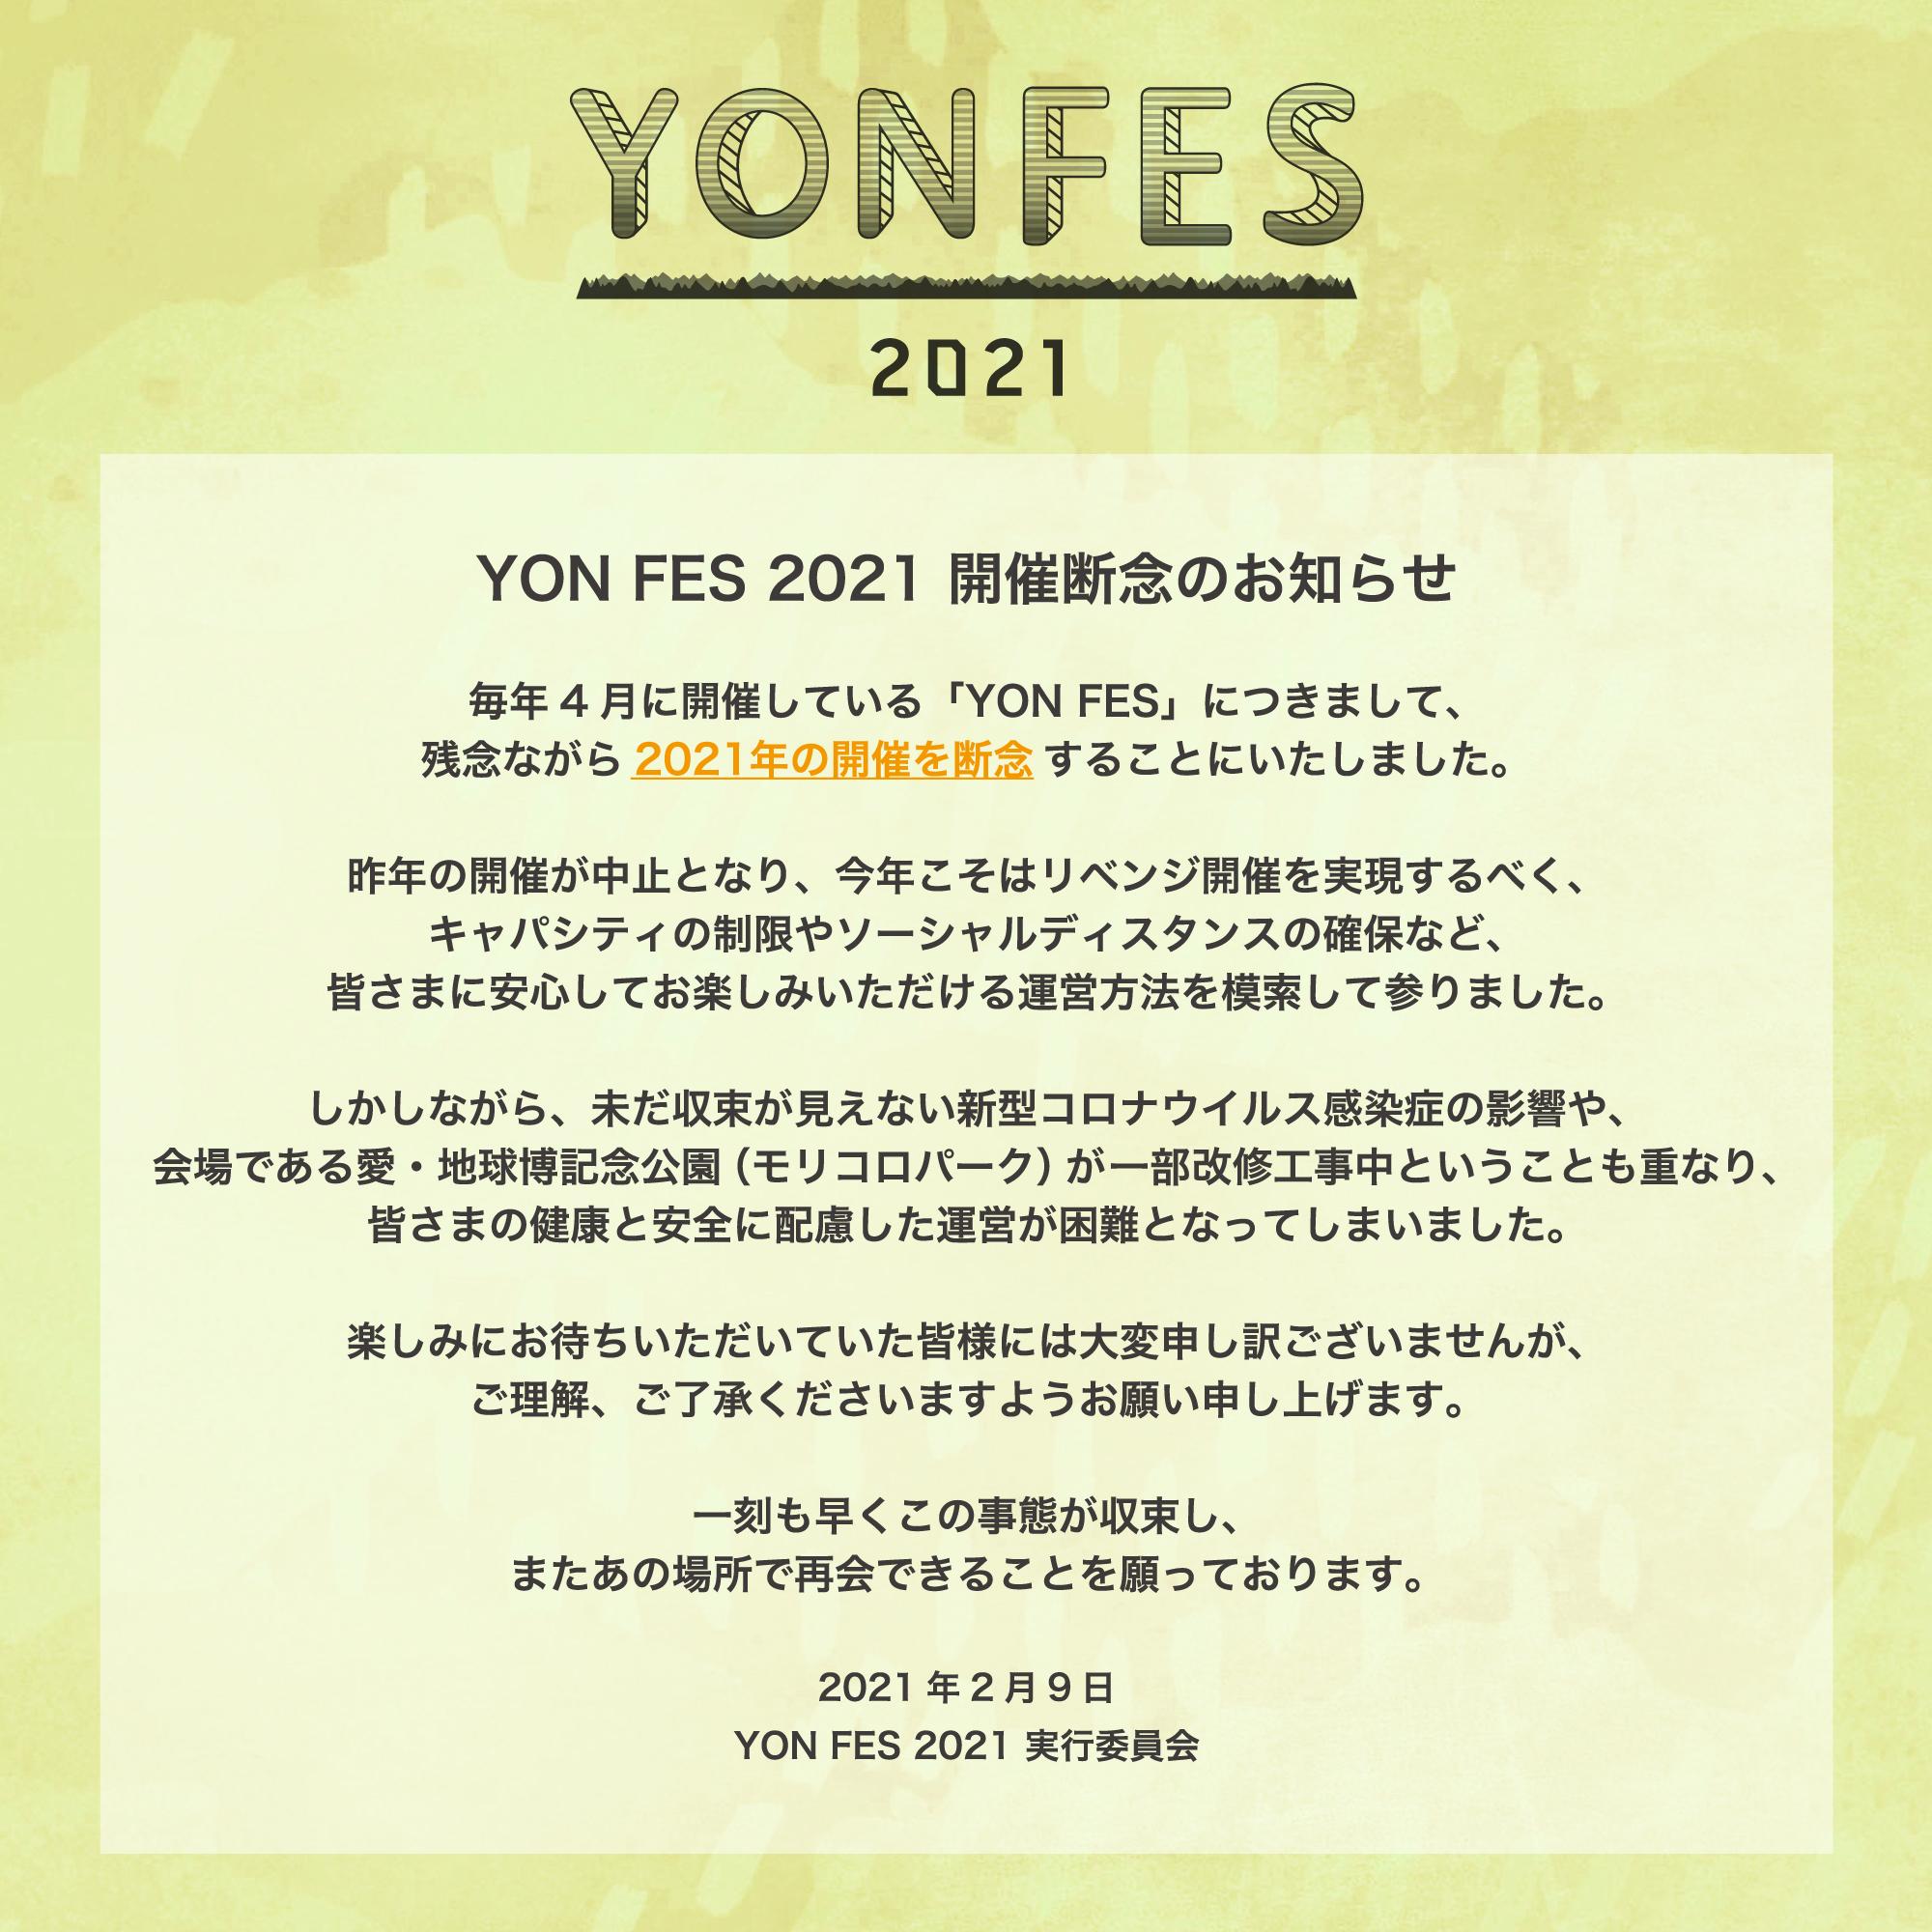 YON FES 2021  開催断念のお知らせ